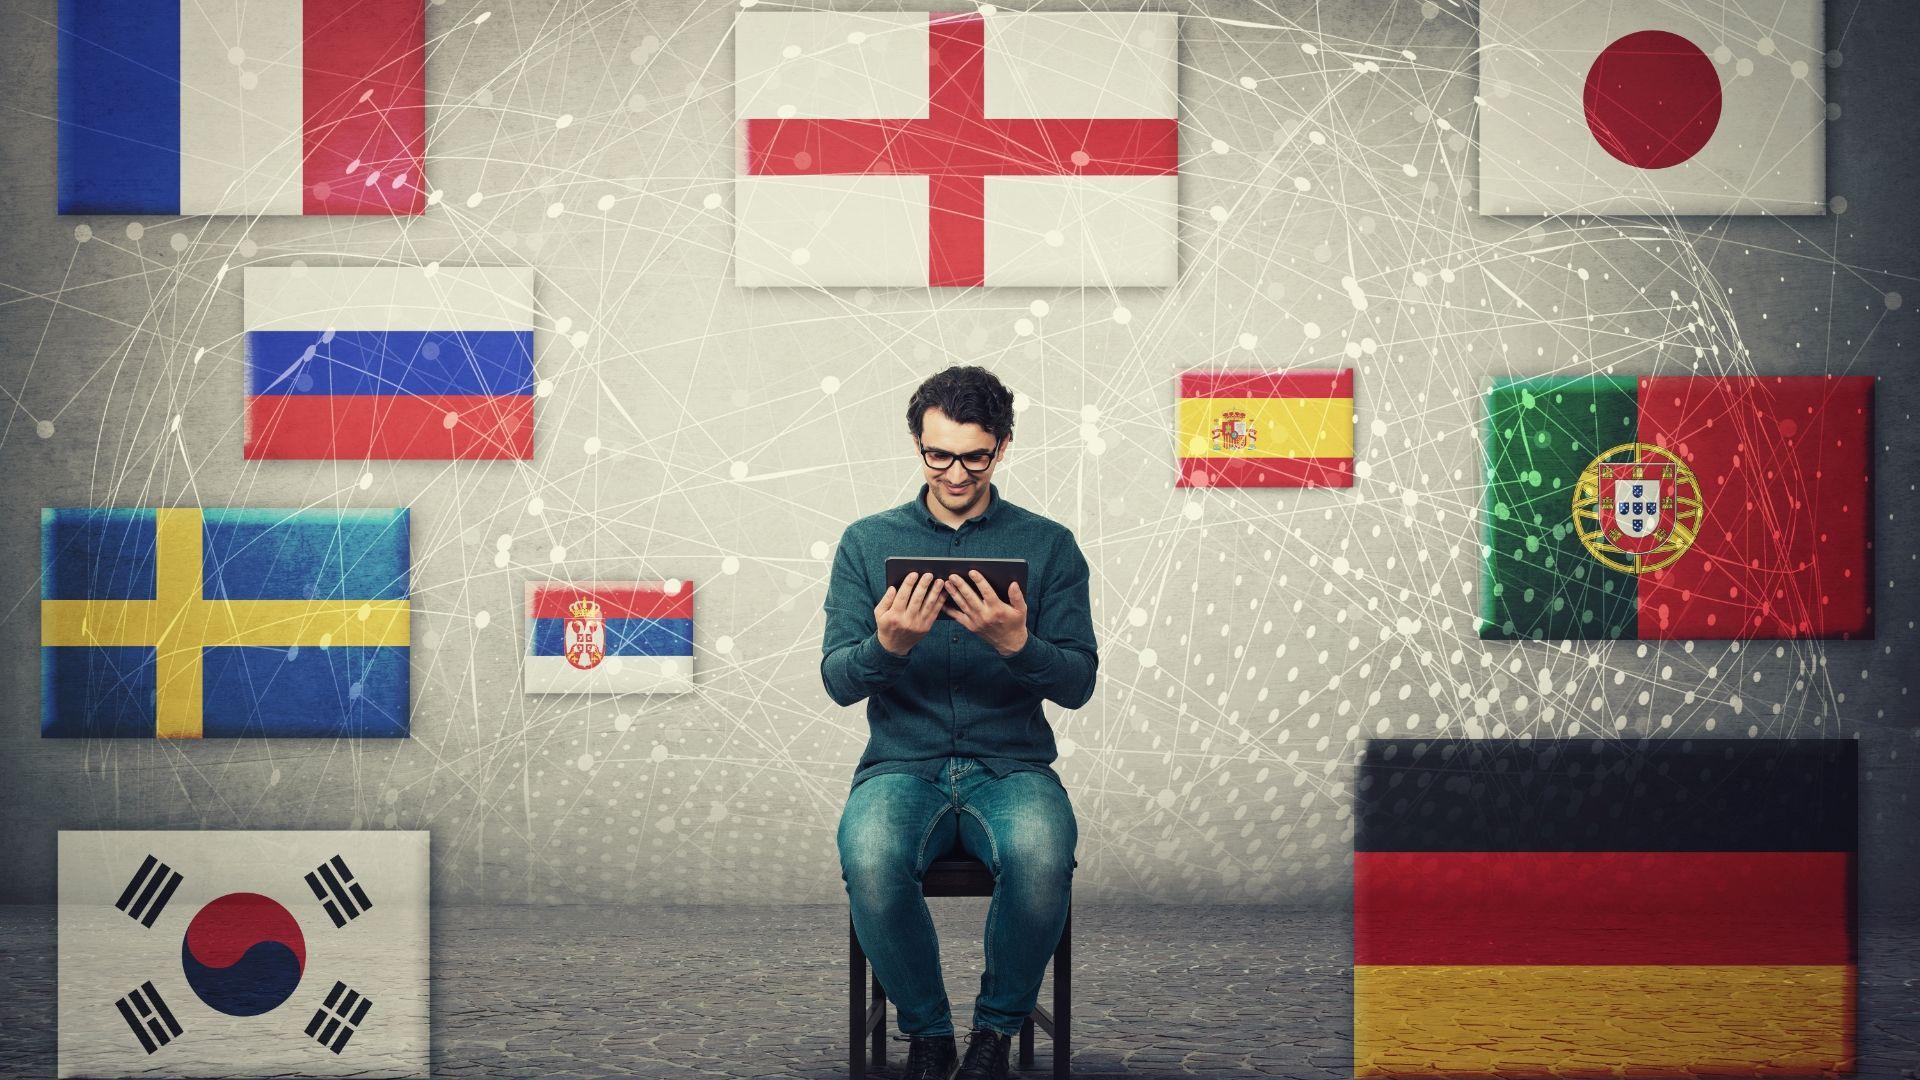 Localization services, professional translation, dubbing services